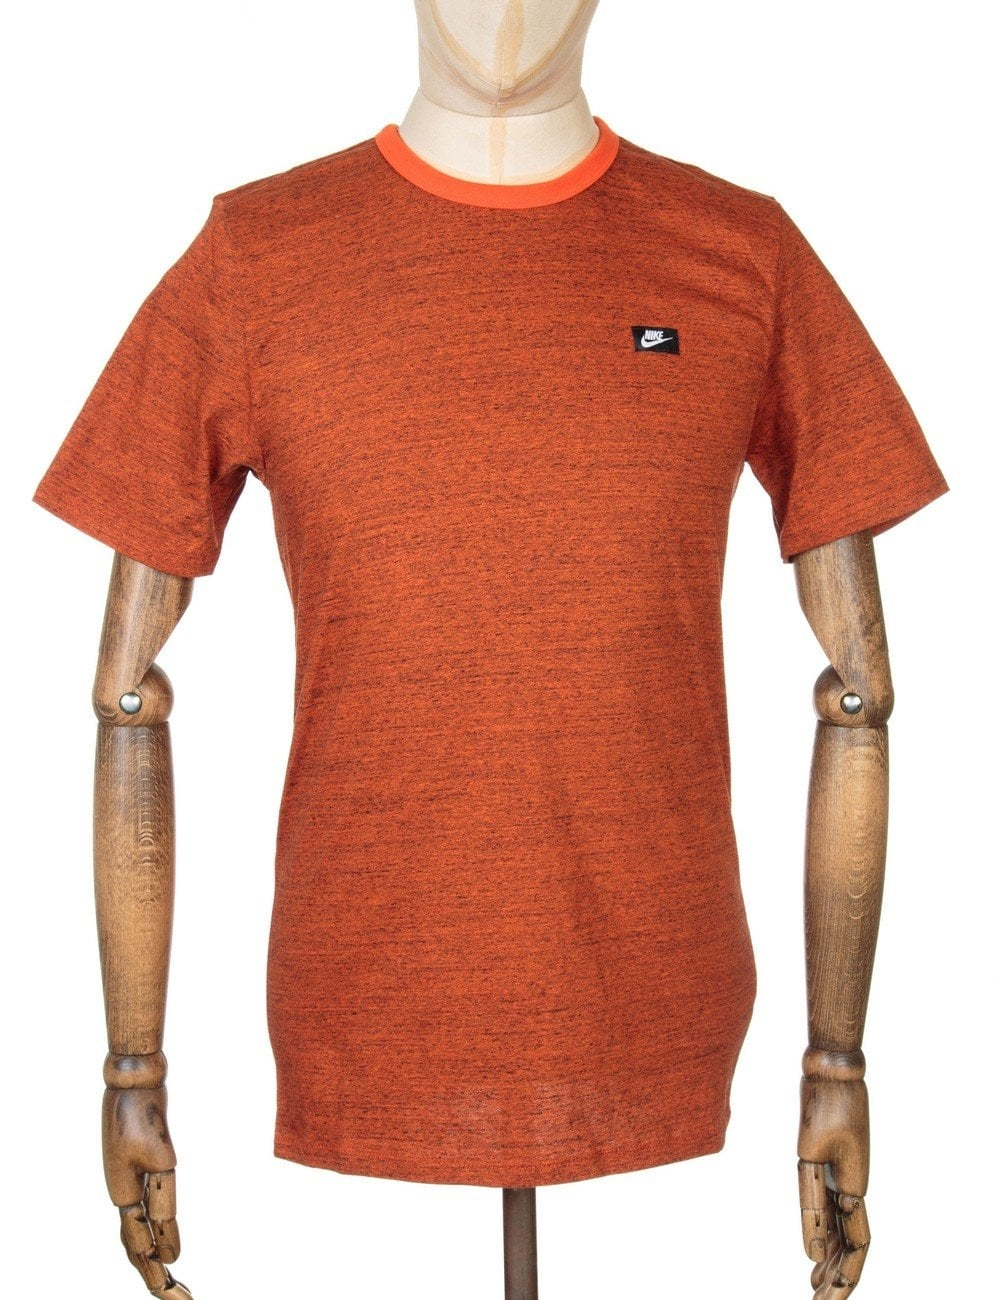 17af0b2a Nike Shoe Box T-shirt - Team Orange - Clothing from Fat Buddha Store UK